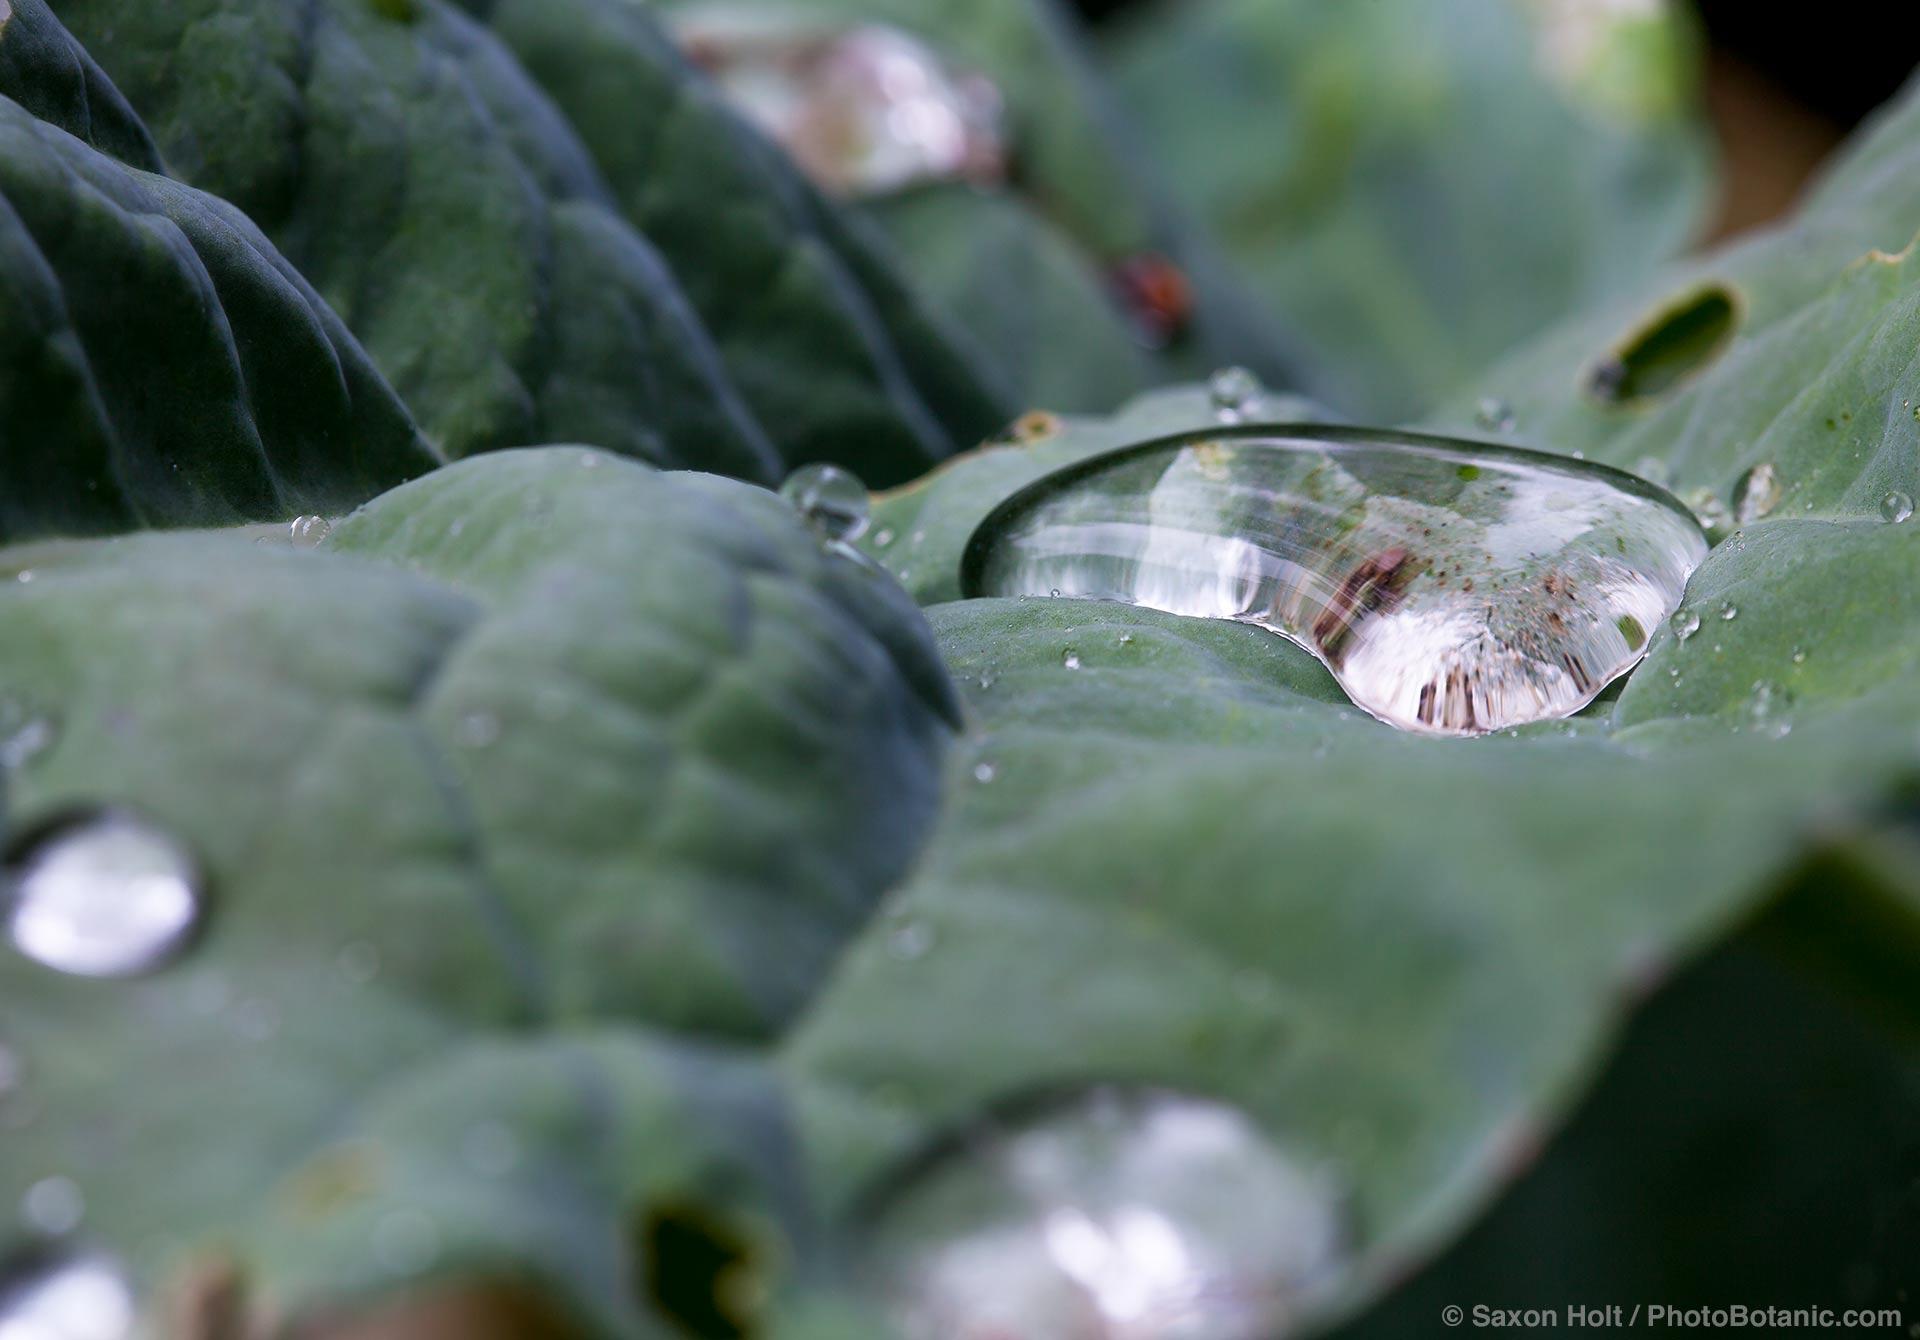 Spring rain drops on broccoli leaves in California garden